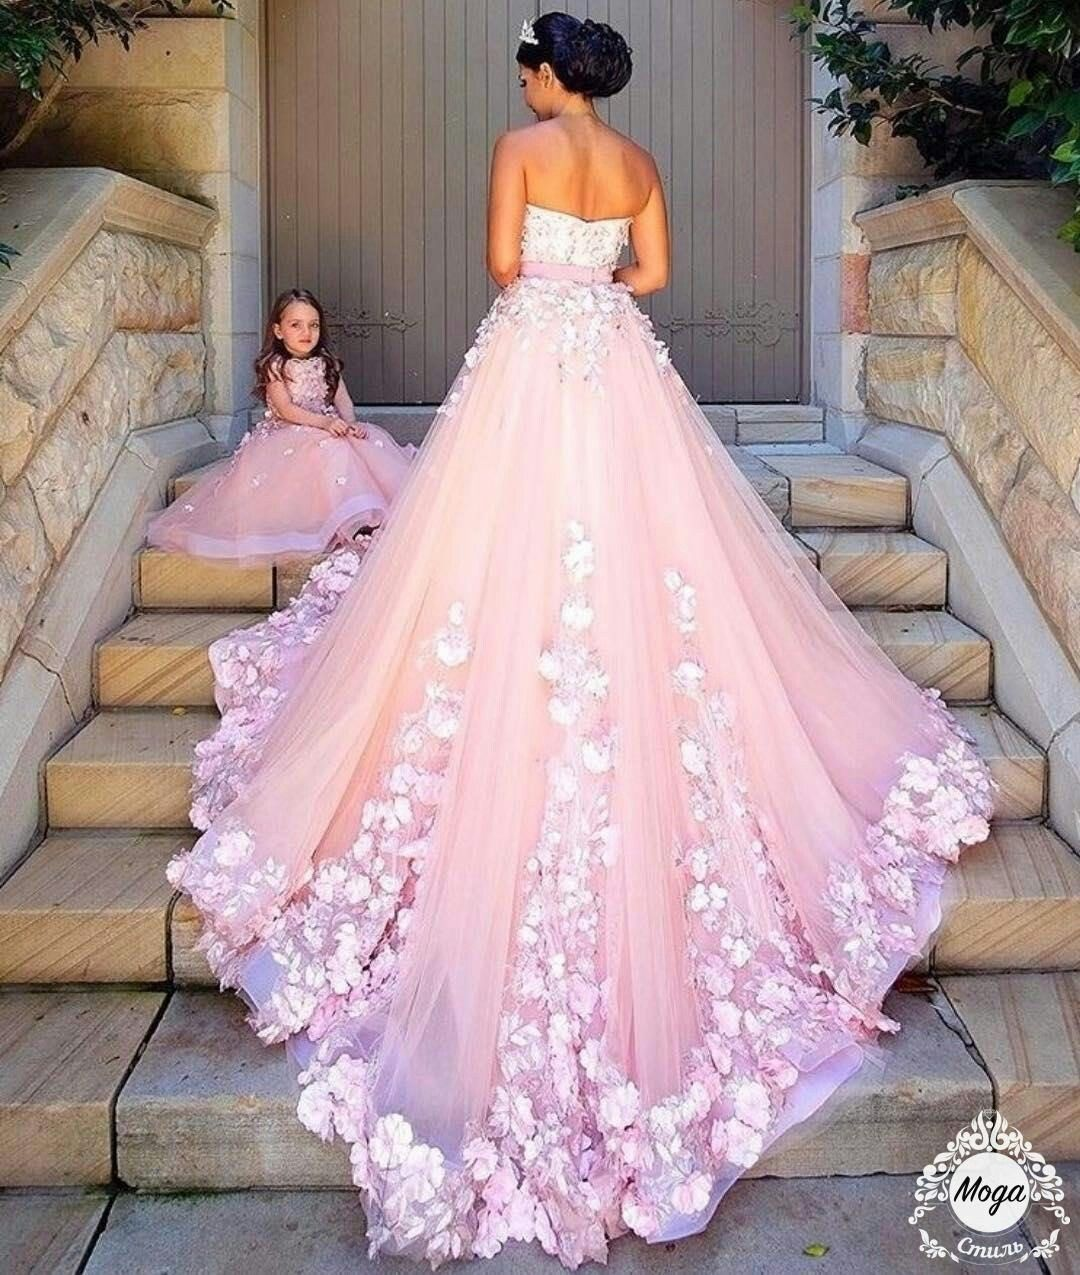 Pin de Oksana Kanajpe en šaty pro nevěstu | Pinterest